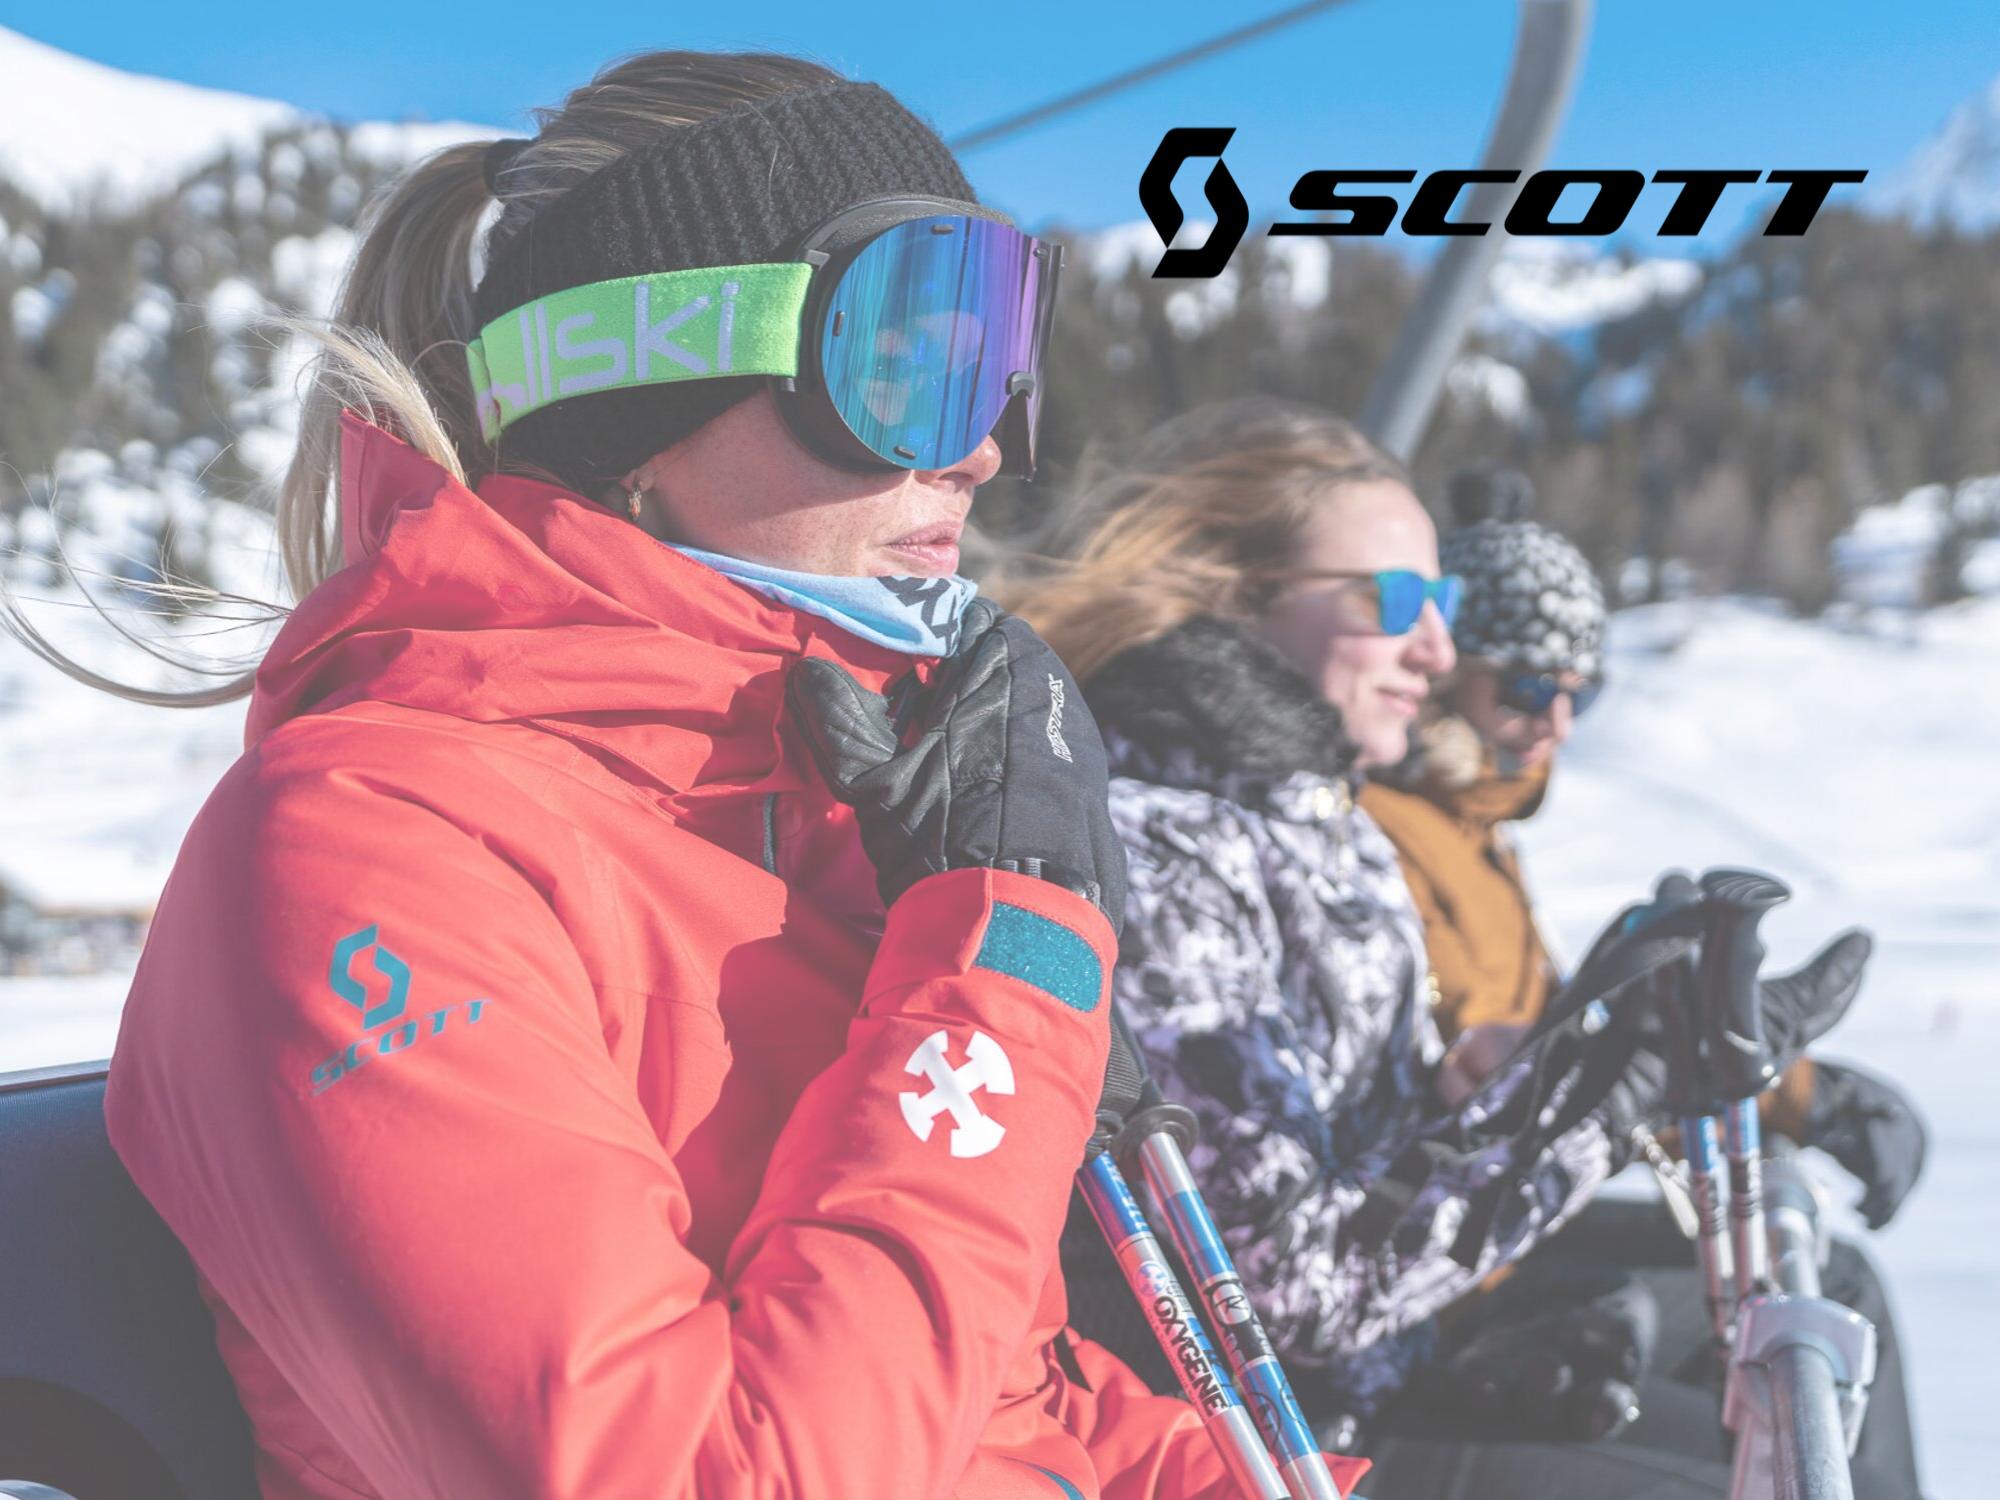 SCOTT women ski jacket and pants rental by Oxygene